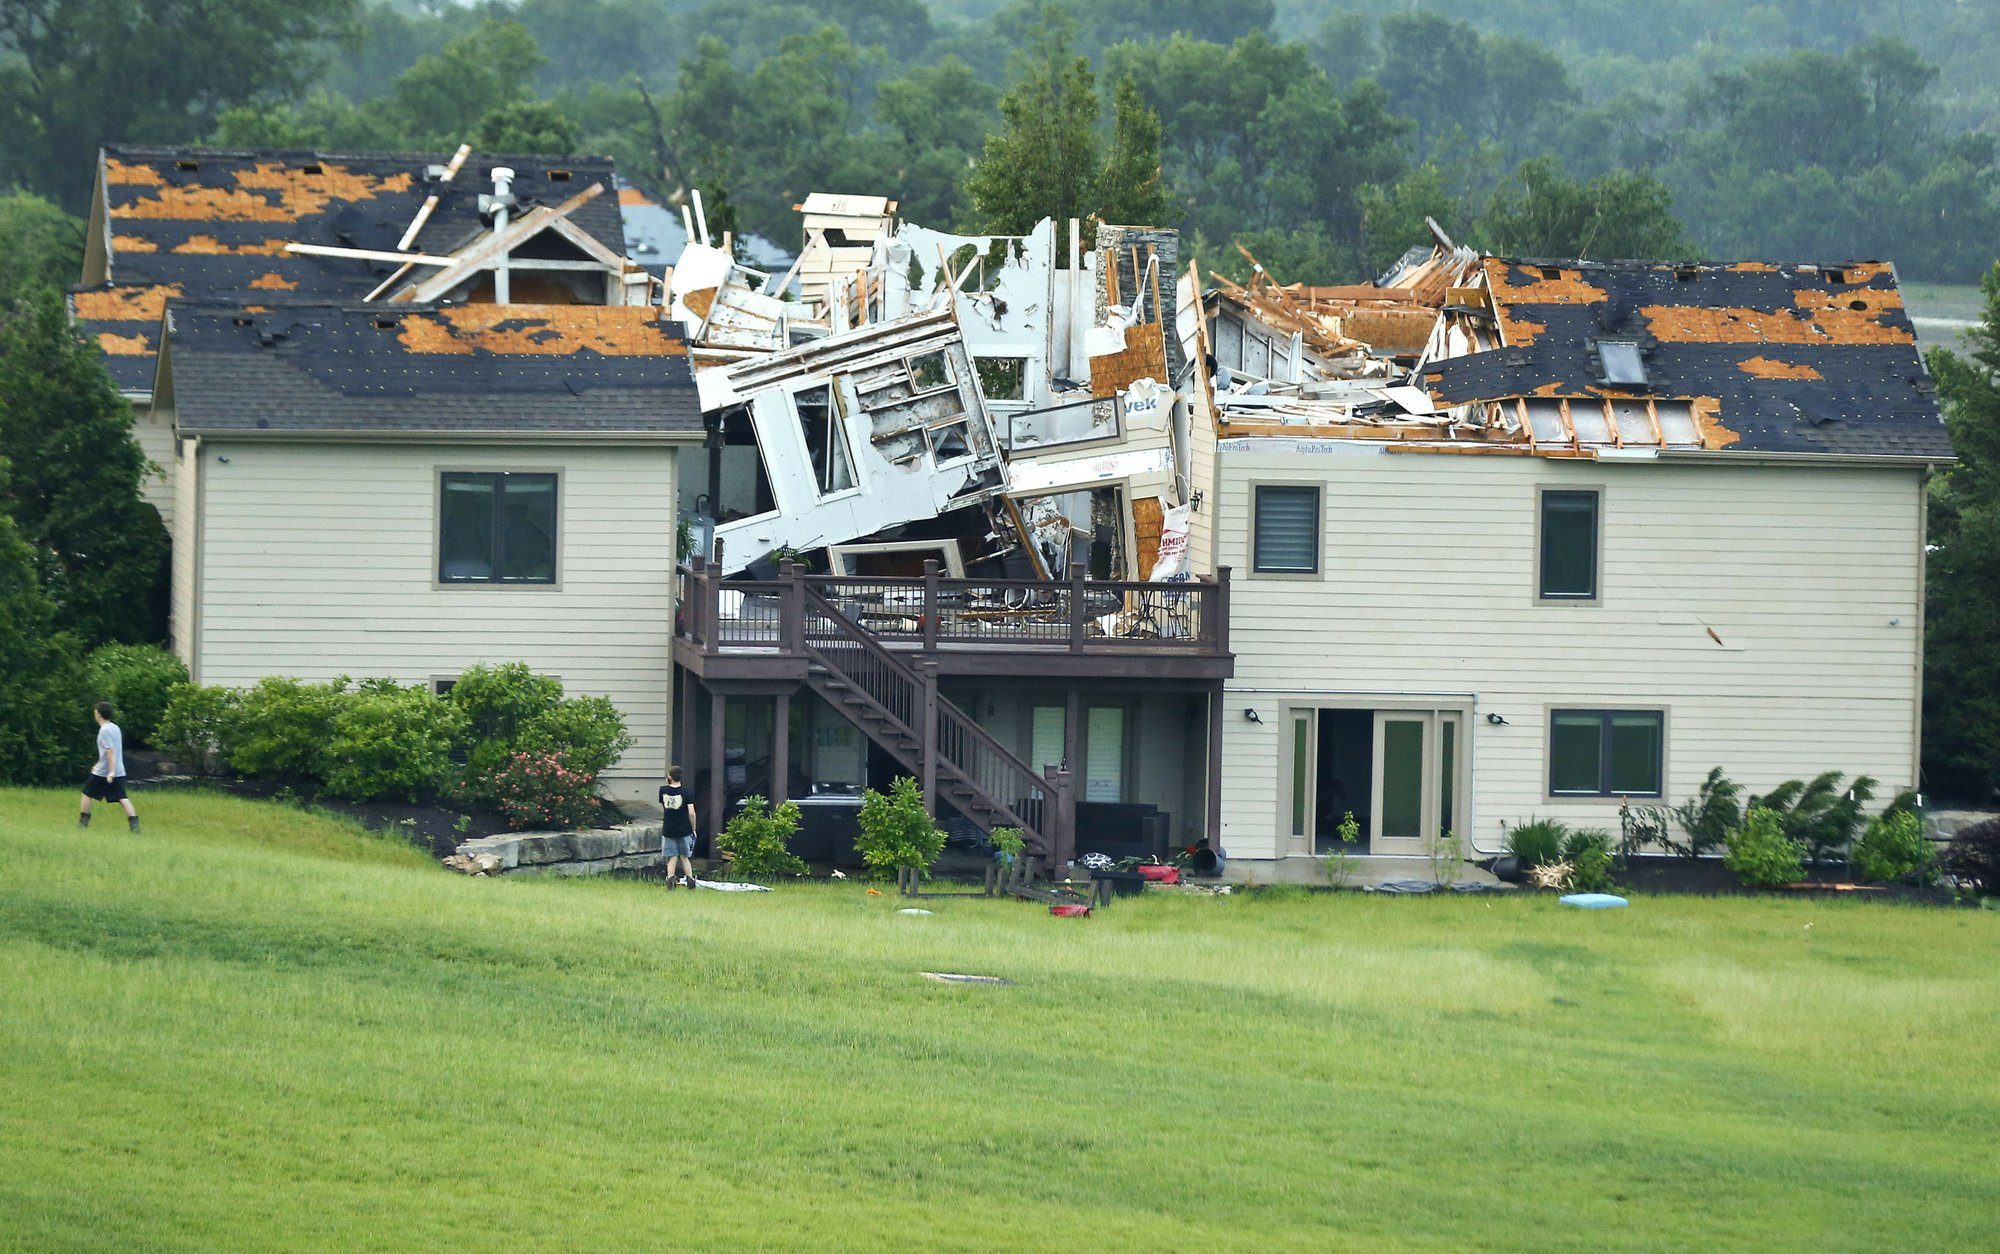 Kansas Tornado Destroys Home May 2019